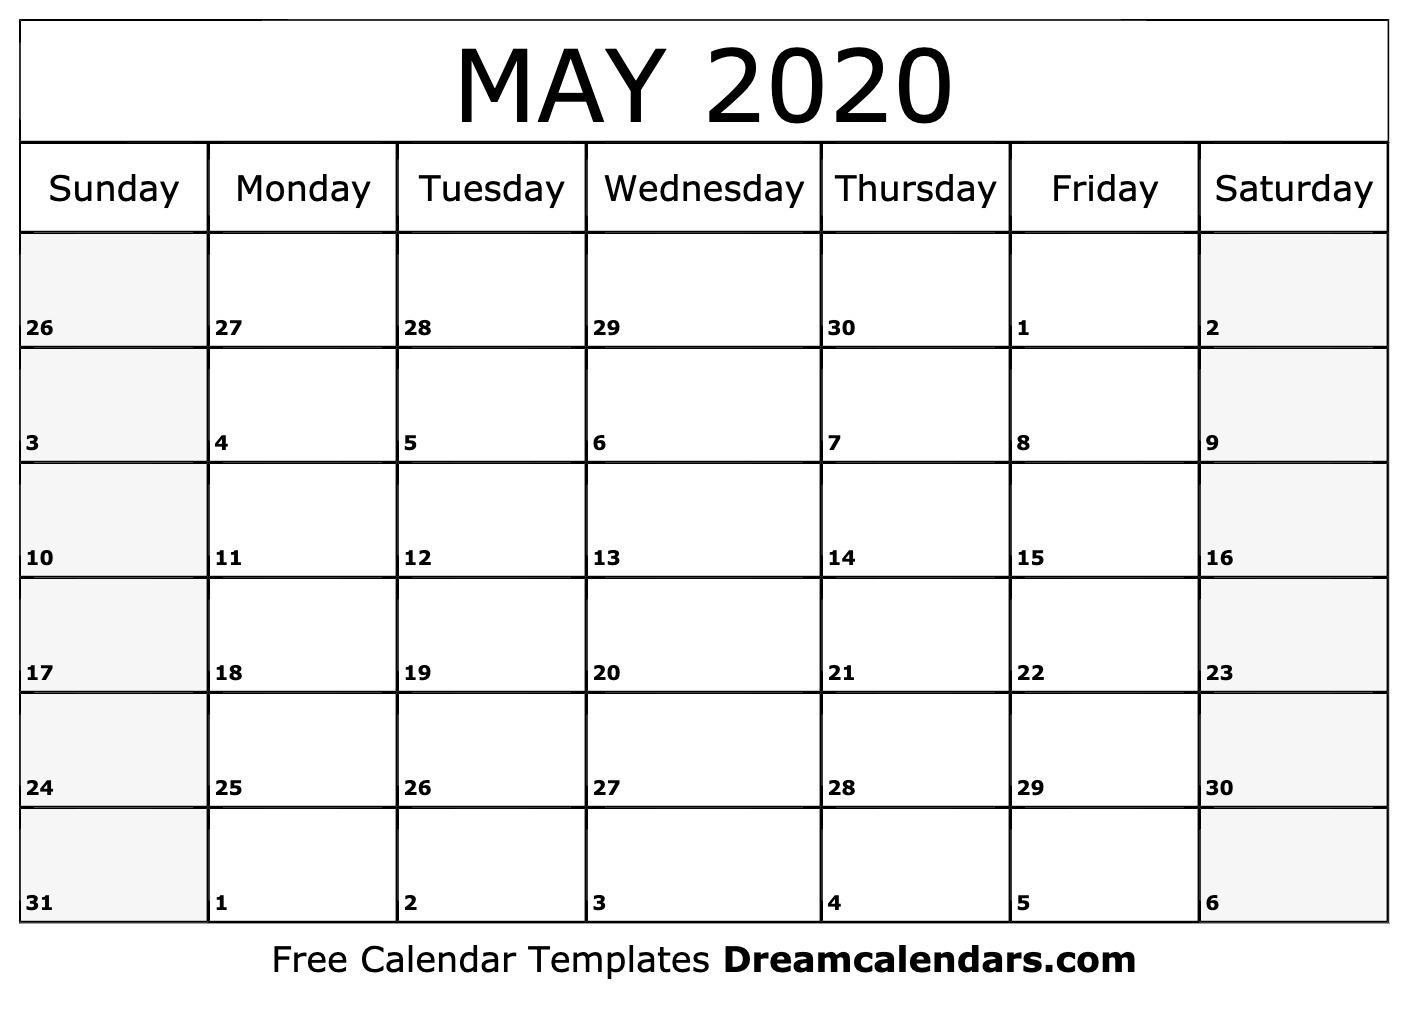 2020 May Printable Calendar  Bolan.horizonconsulting.co with November 2020 Calendar Beta Calendars